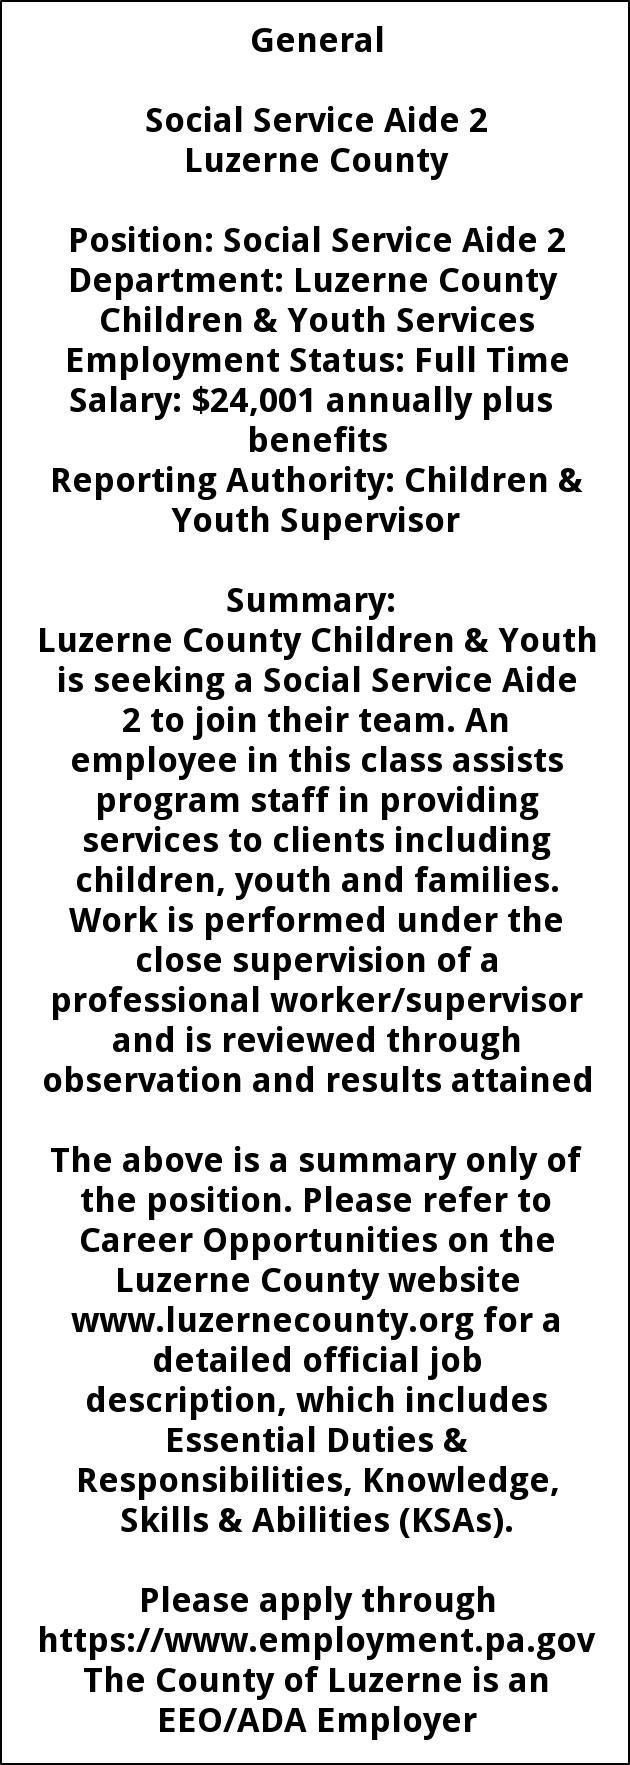 Social Service Aide 2